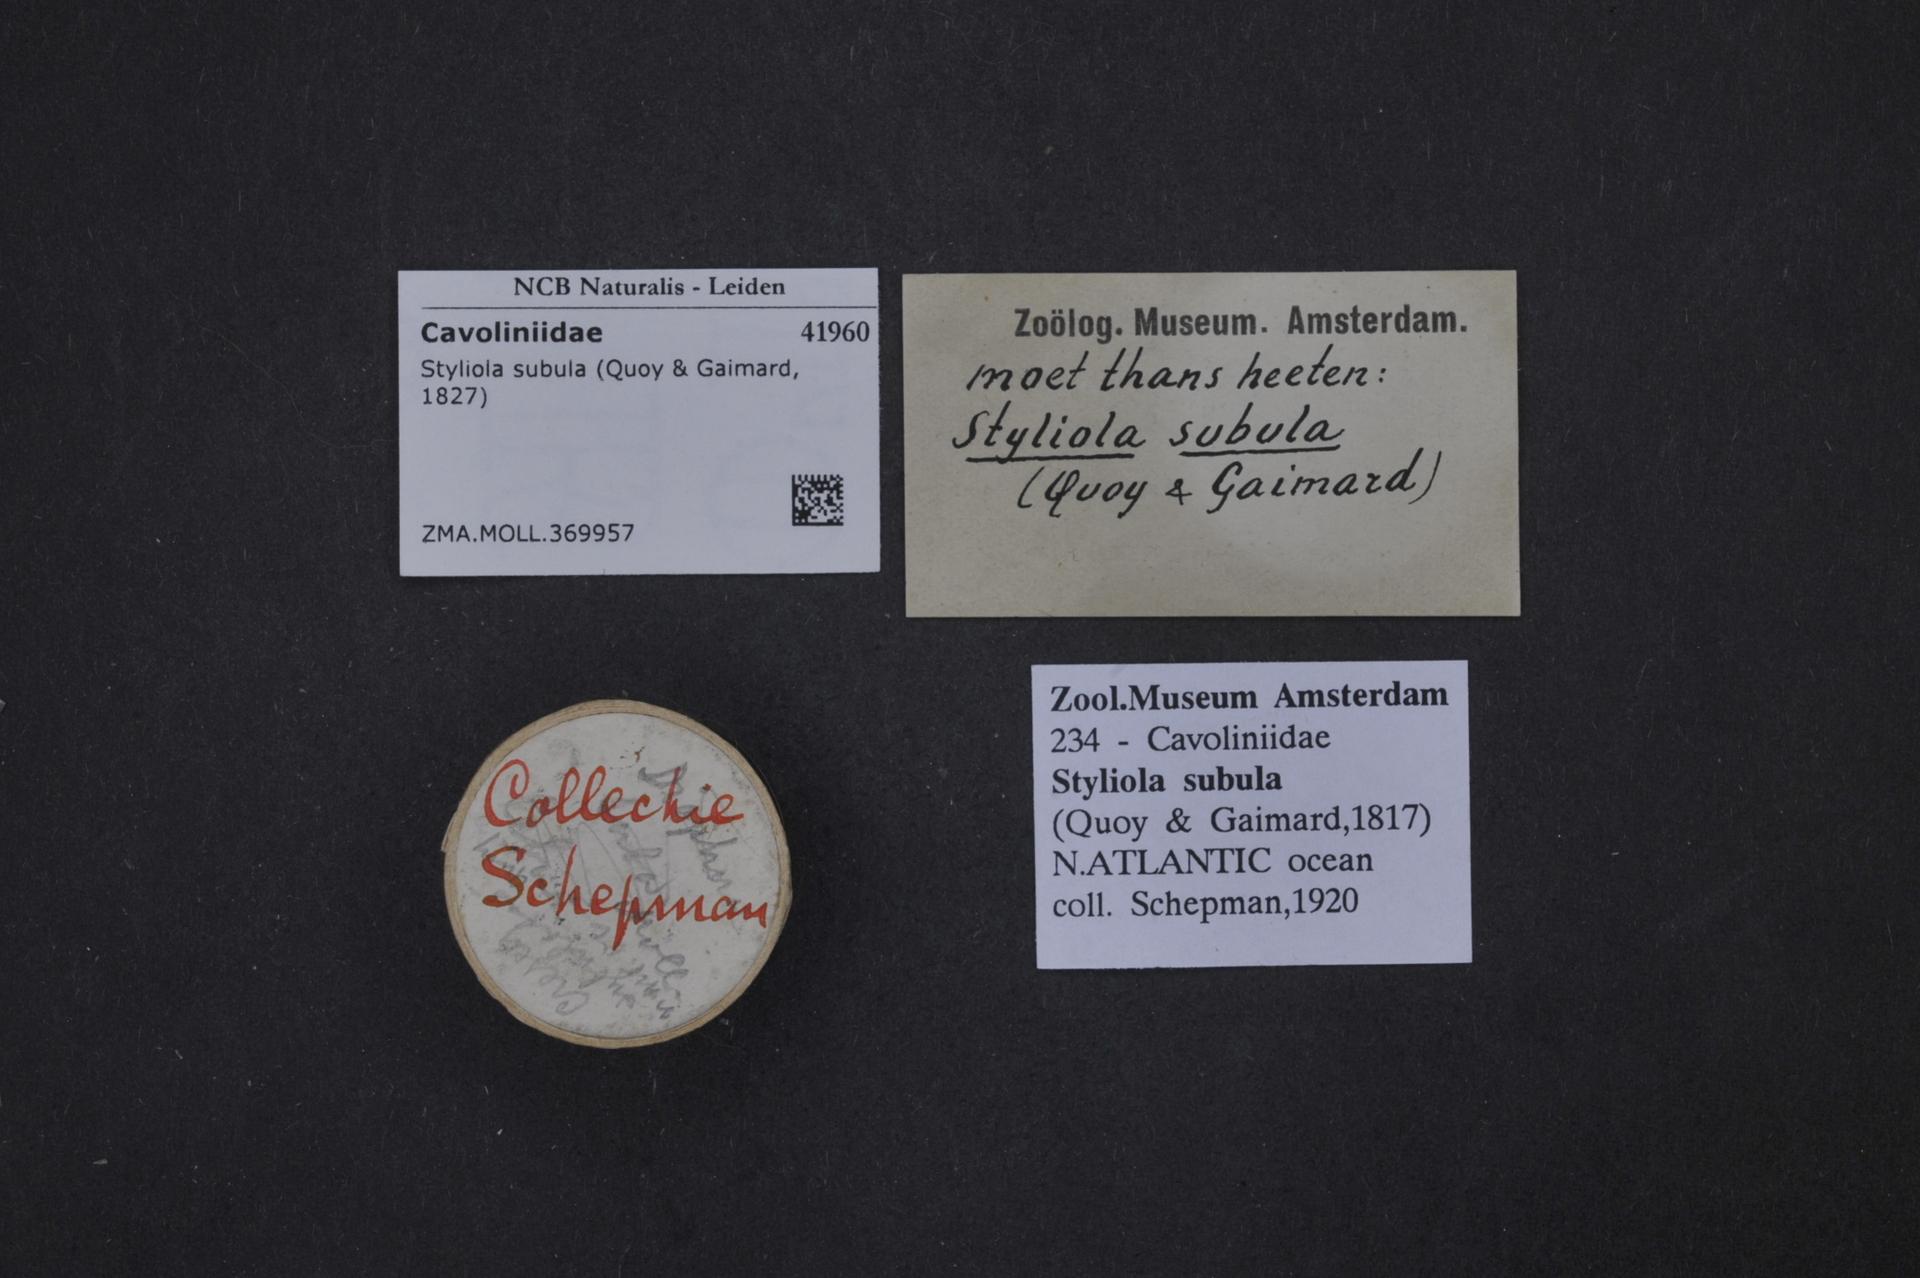 ZMA.MOLL.369957 | Styliola subula (Quoy & Gaimard, 1827)